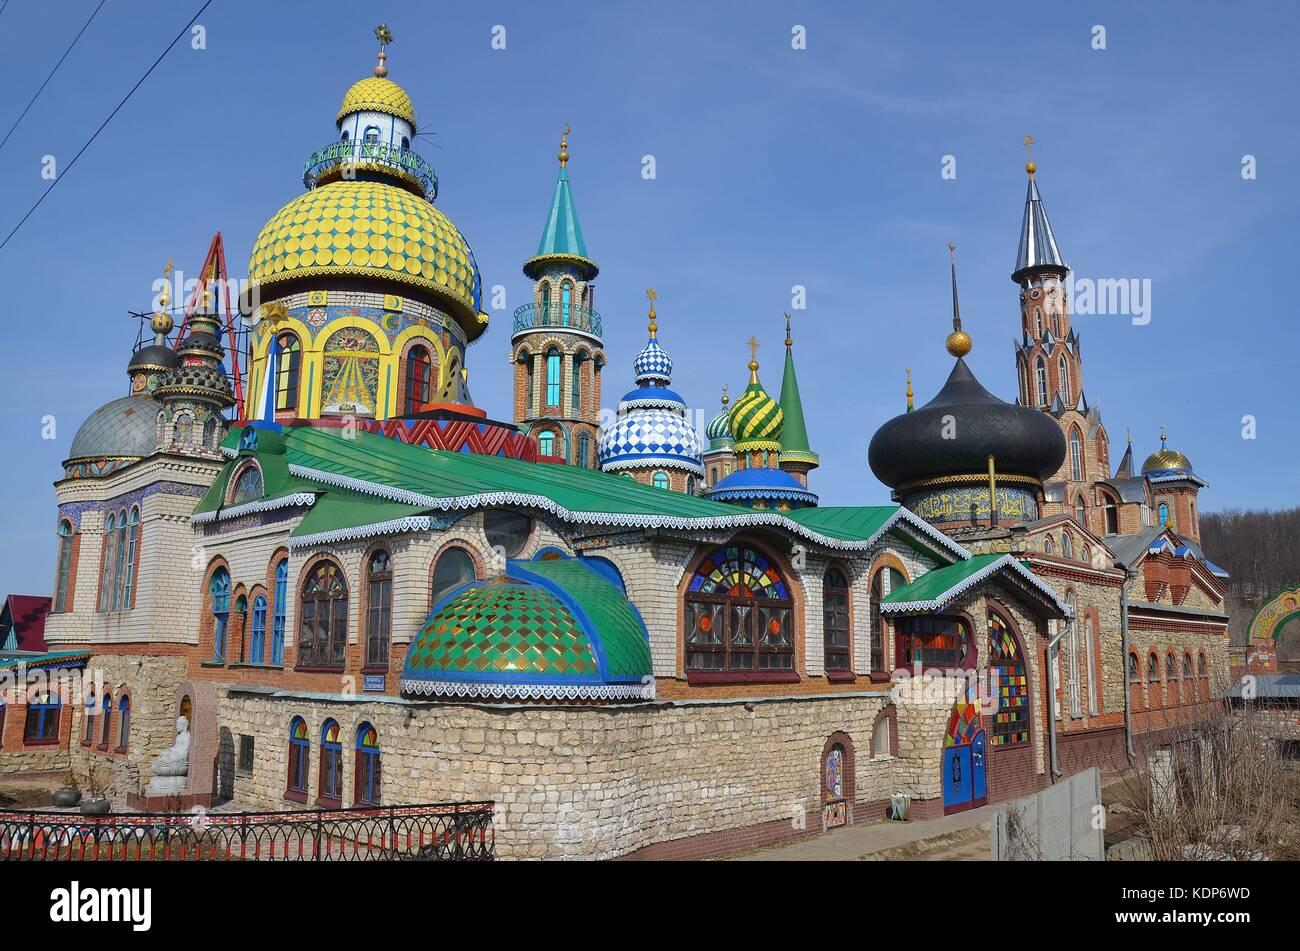 Kathedrale aller Religionen in Arakchino bei Kazan, Tatarstan, Russland - Stock Image